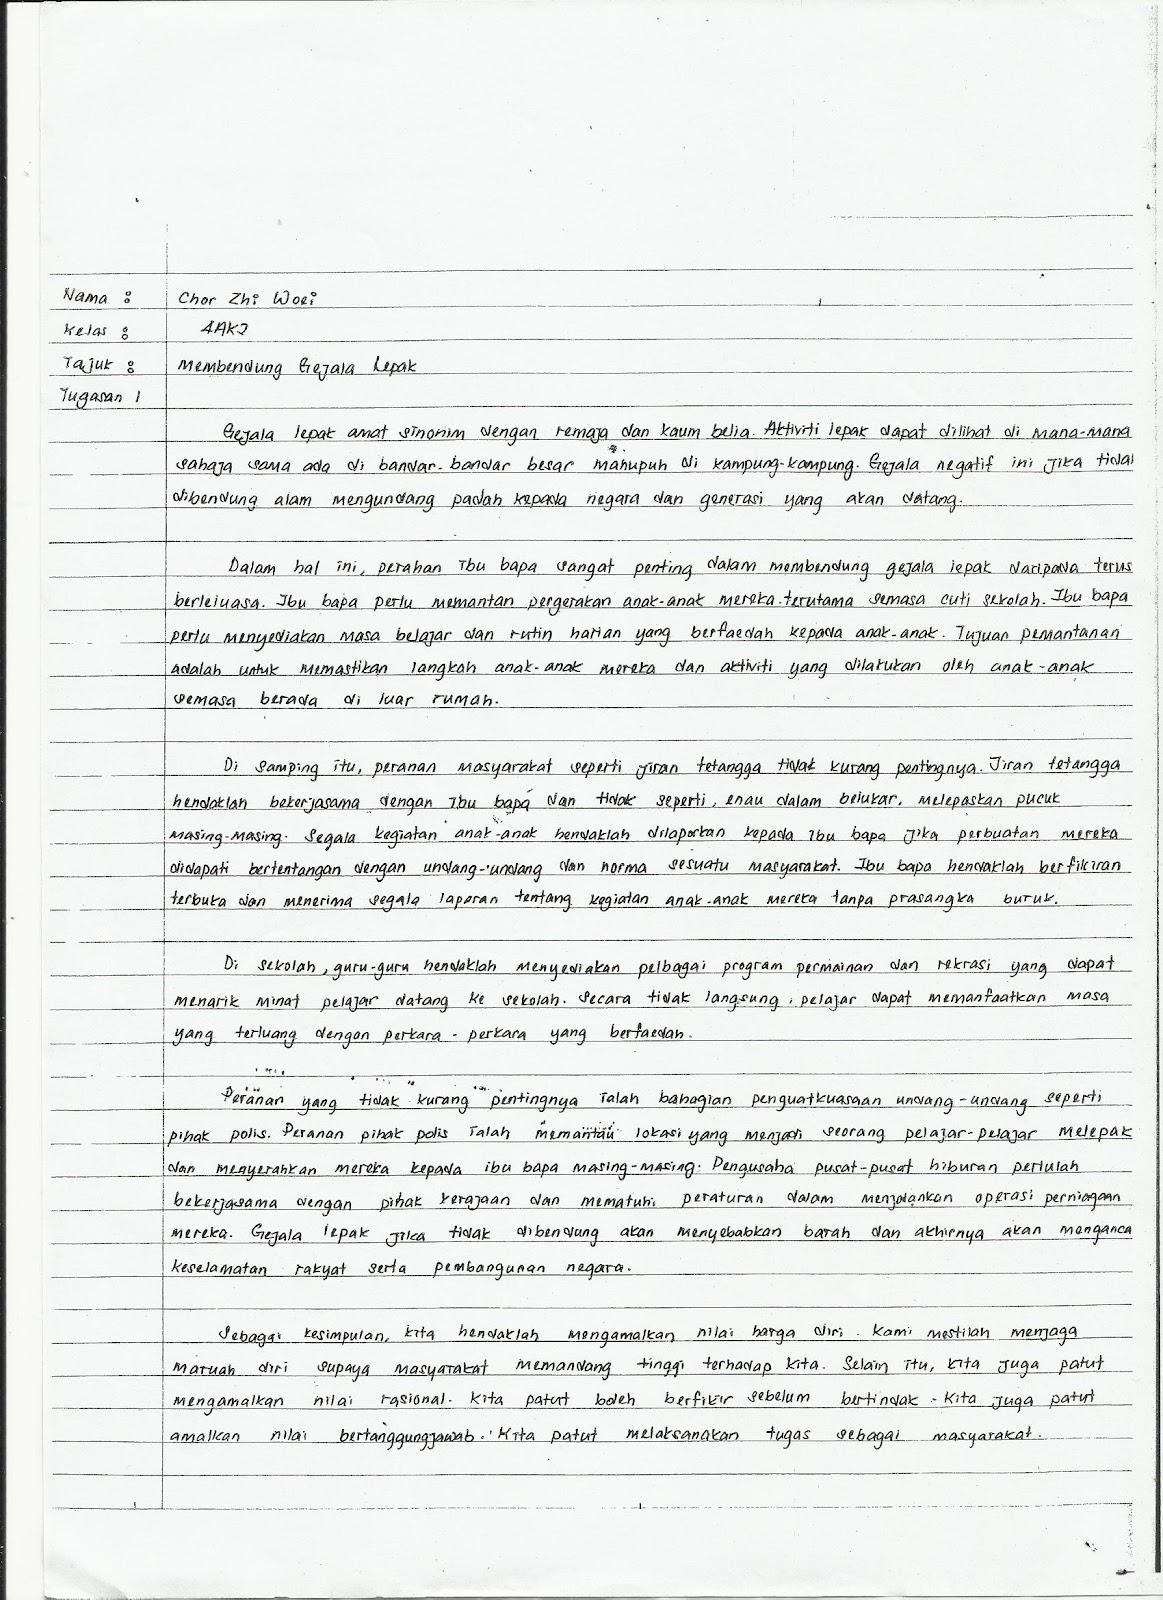 Exclusive Through My Mind Contoh Tugasan Harian Pend